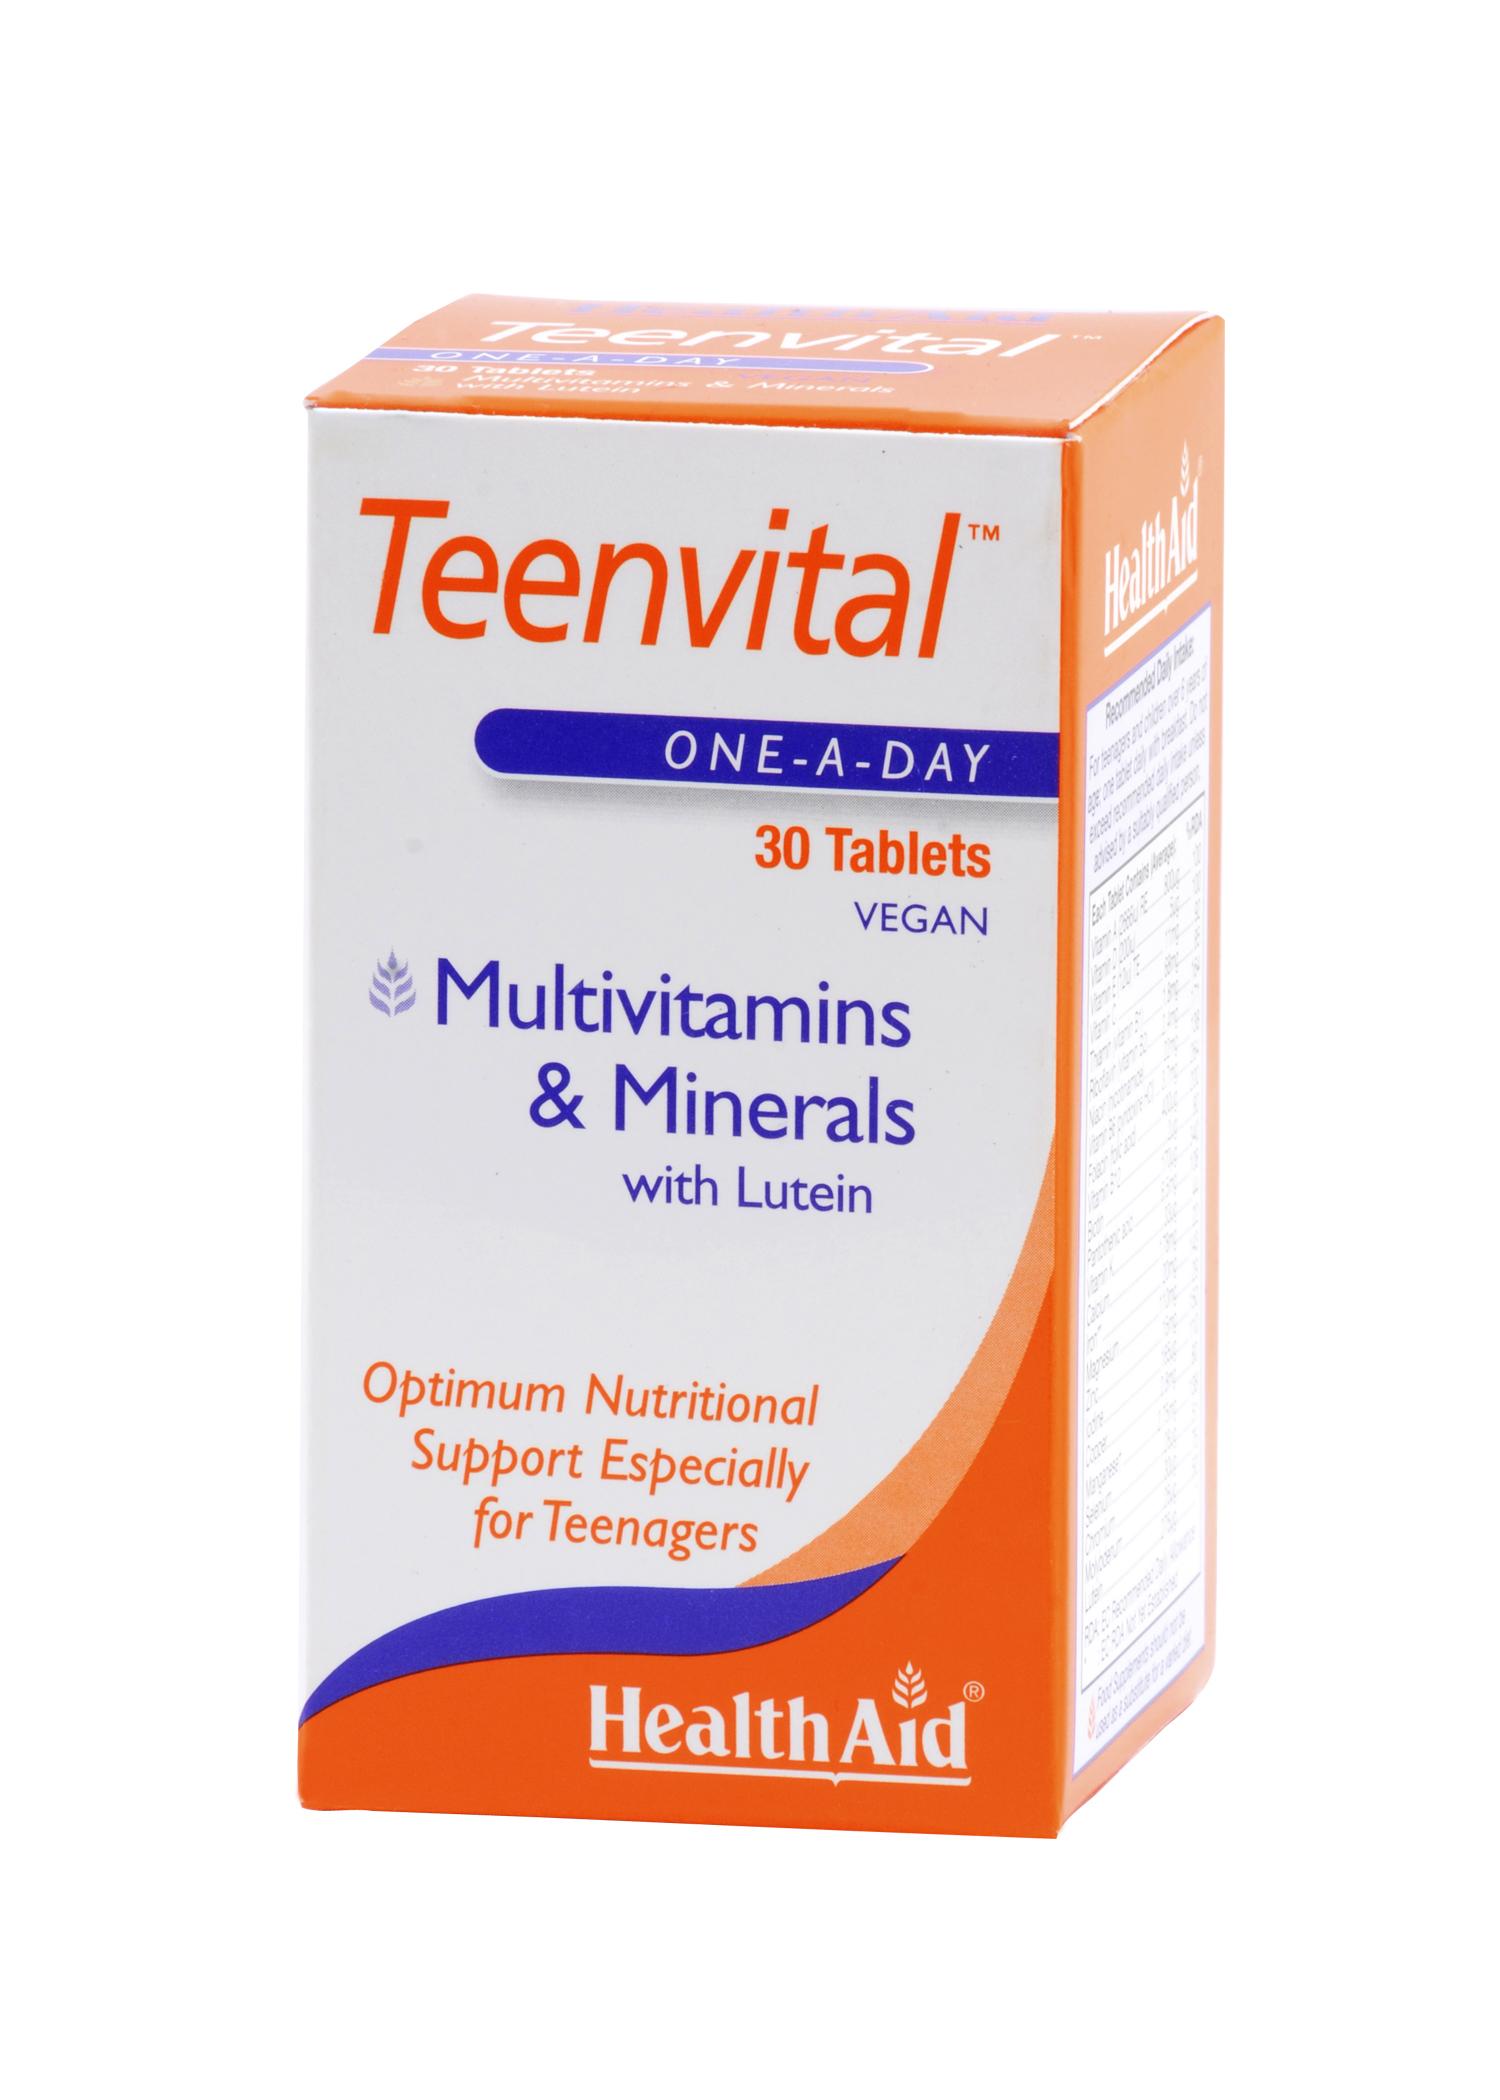 Health Aid Teenvital Tablets Καλύπτει Τις Ειδικές Απαιτήσεις Των Εφήβων 30tabs (Ages 12-16)